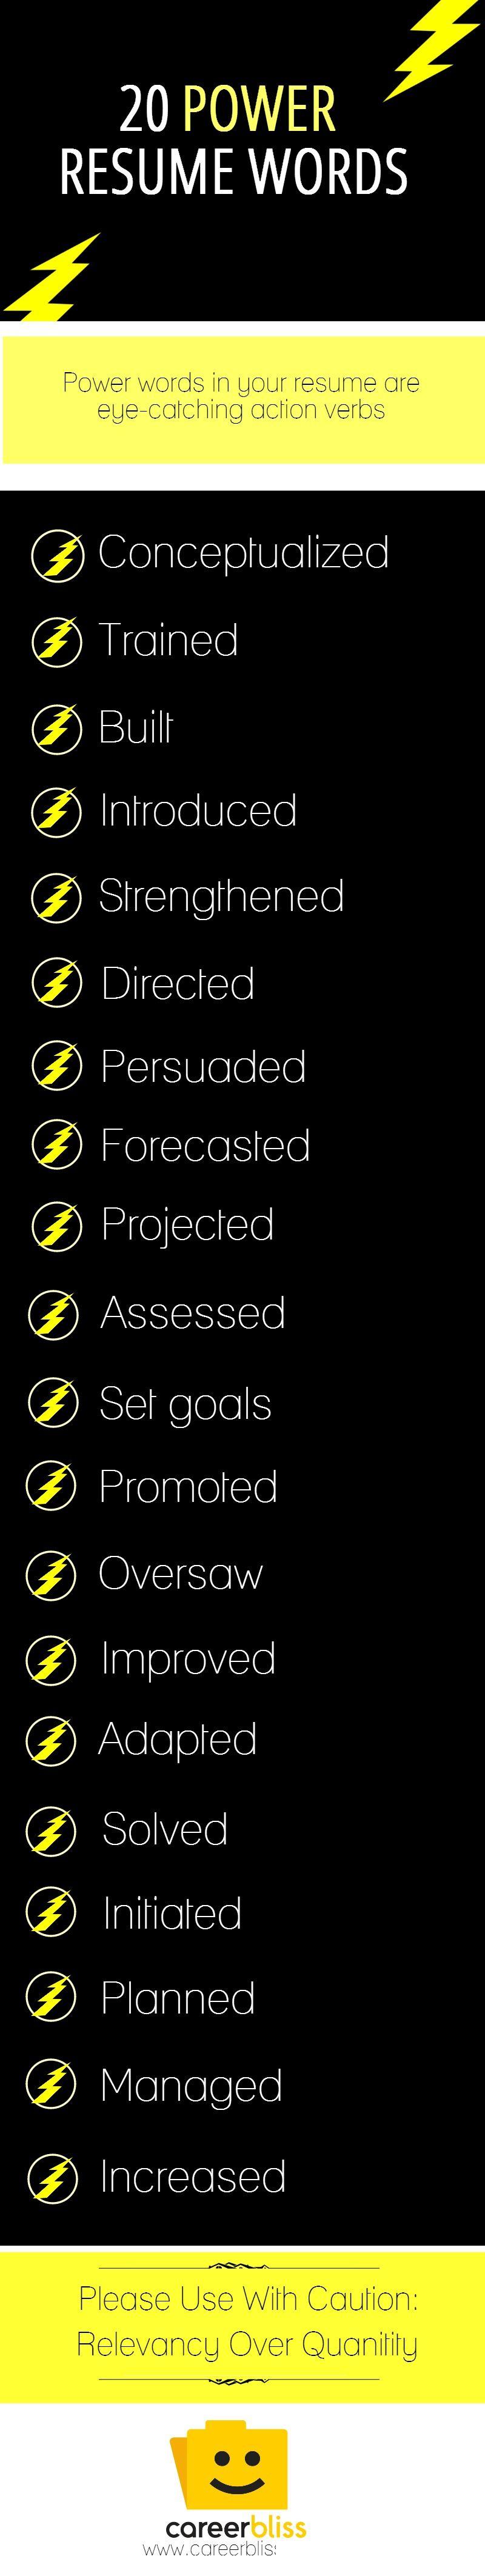 resume power words list